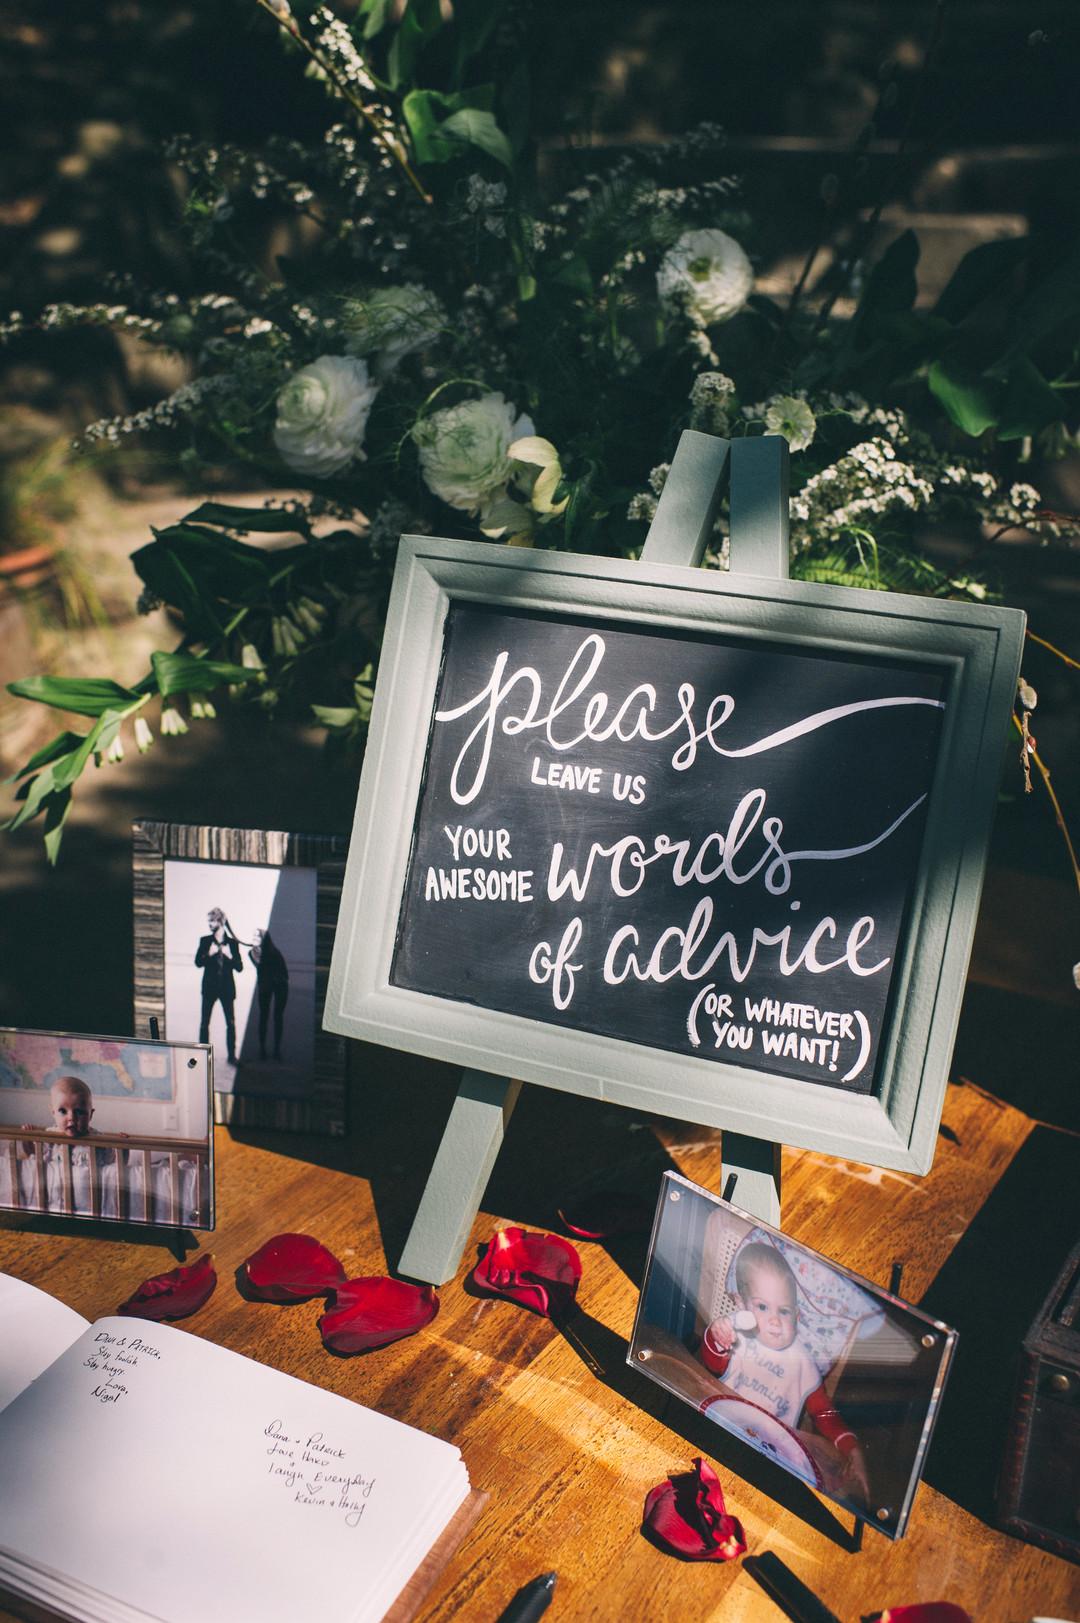 www.santabarbarawedding.com | Sarah Katherine Davis Photography | Santa Barbara Museum of Natural History | Wild Heart Events | Party Pleasers | Marriage Advice Table